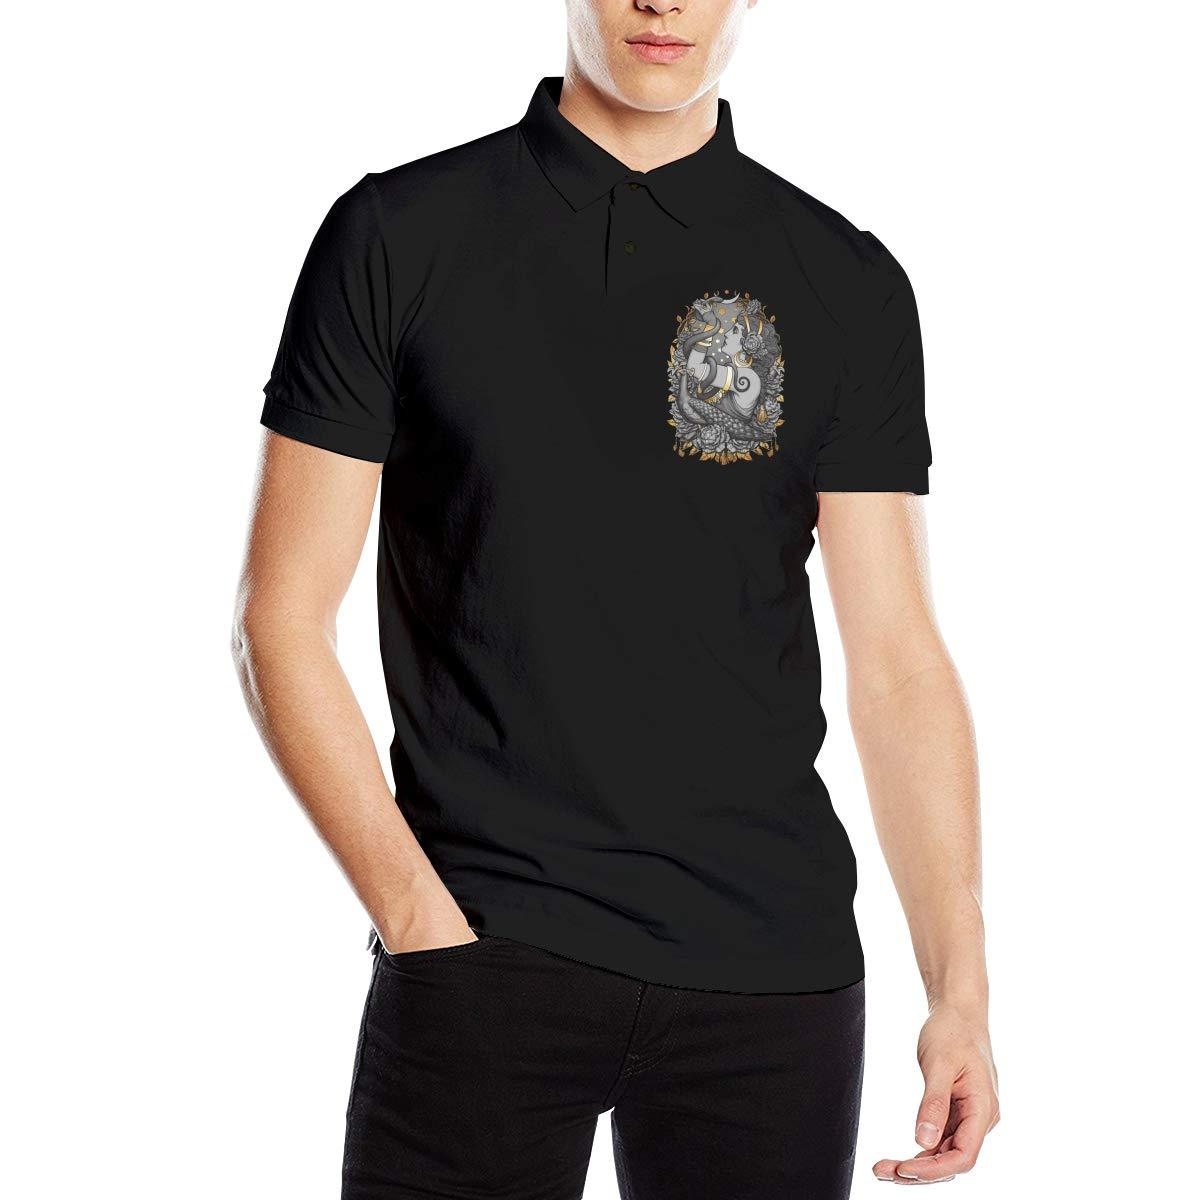 Cjlrqone Tribal Fusion Belly Dance Men Comfortable Polo Shirts Black